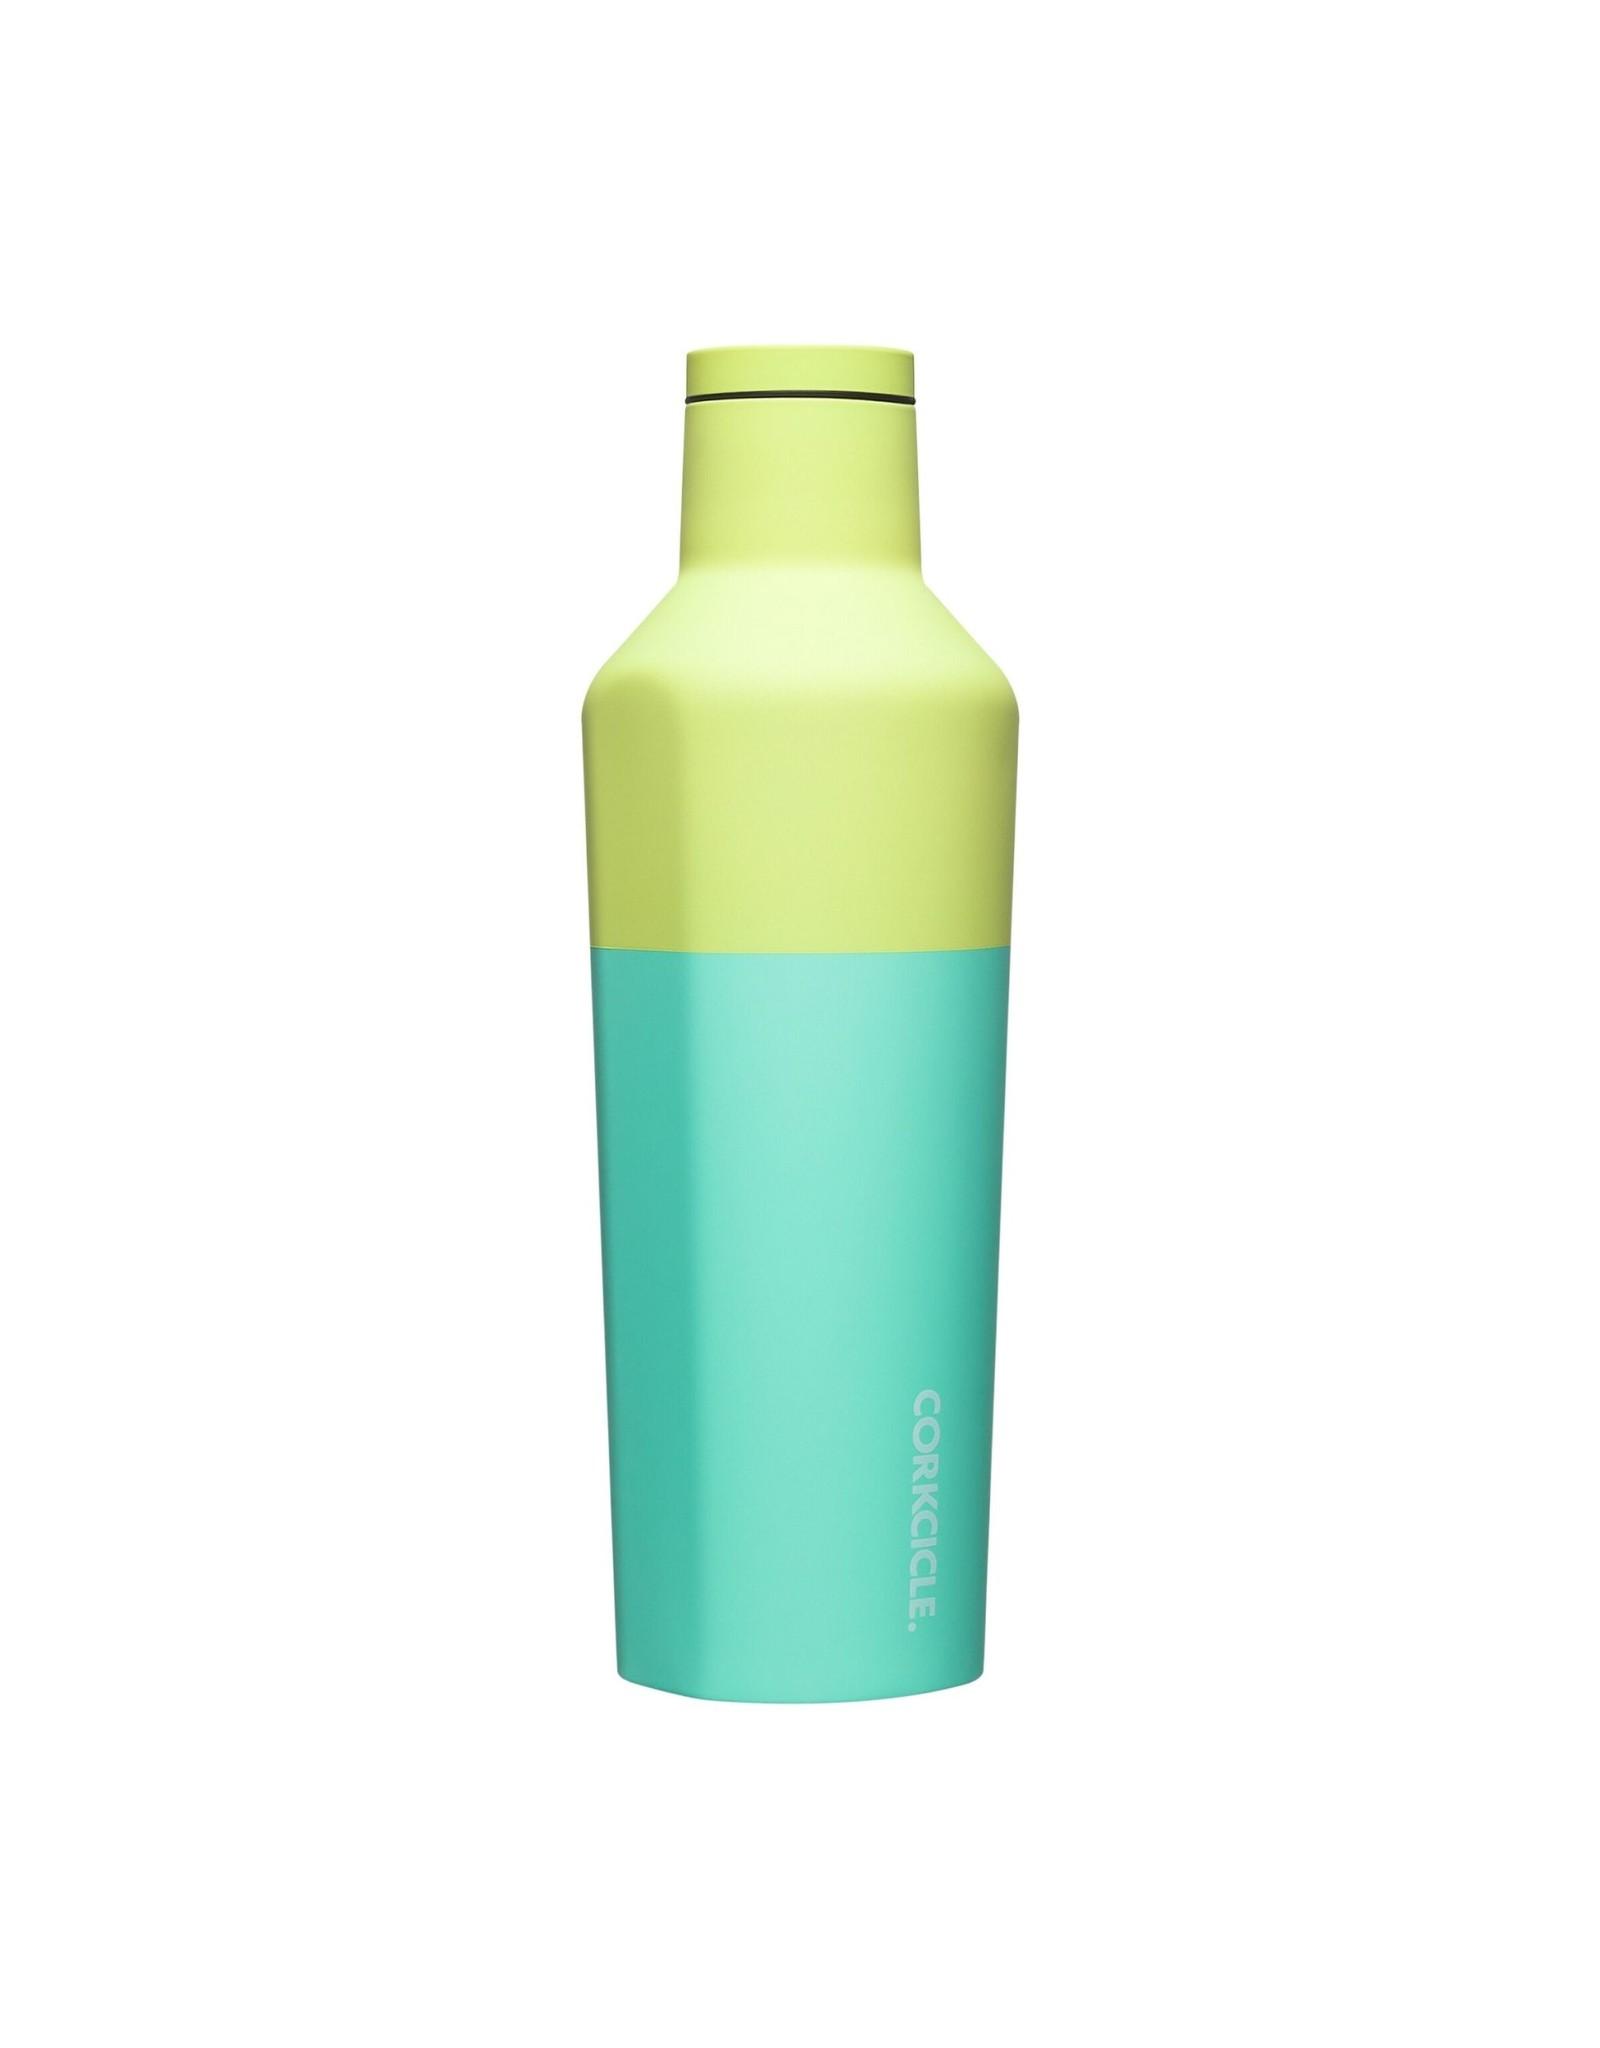 Corkcicle Canteen - 25oz Color Block - Limeade